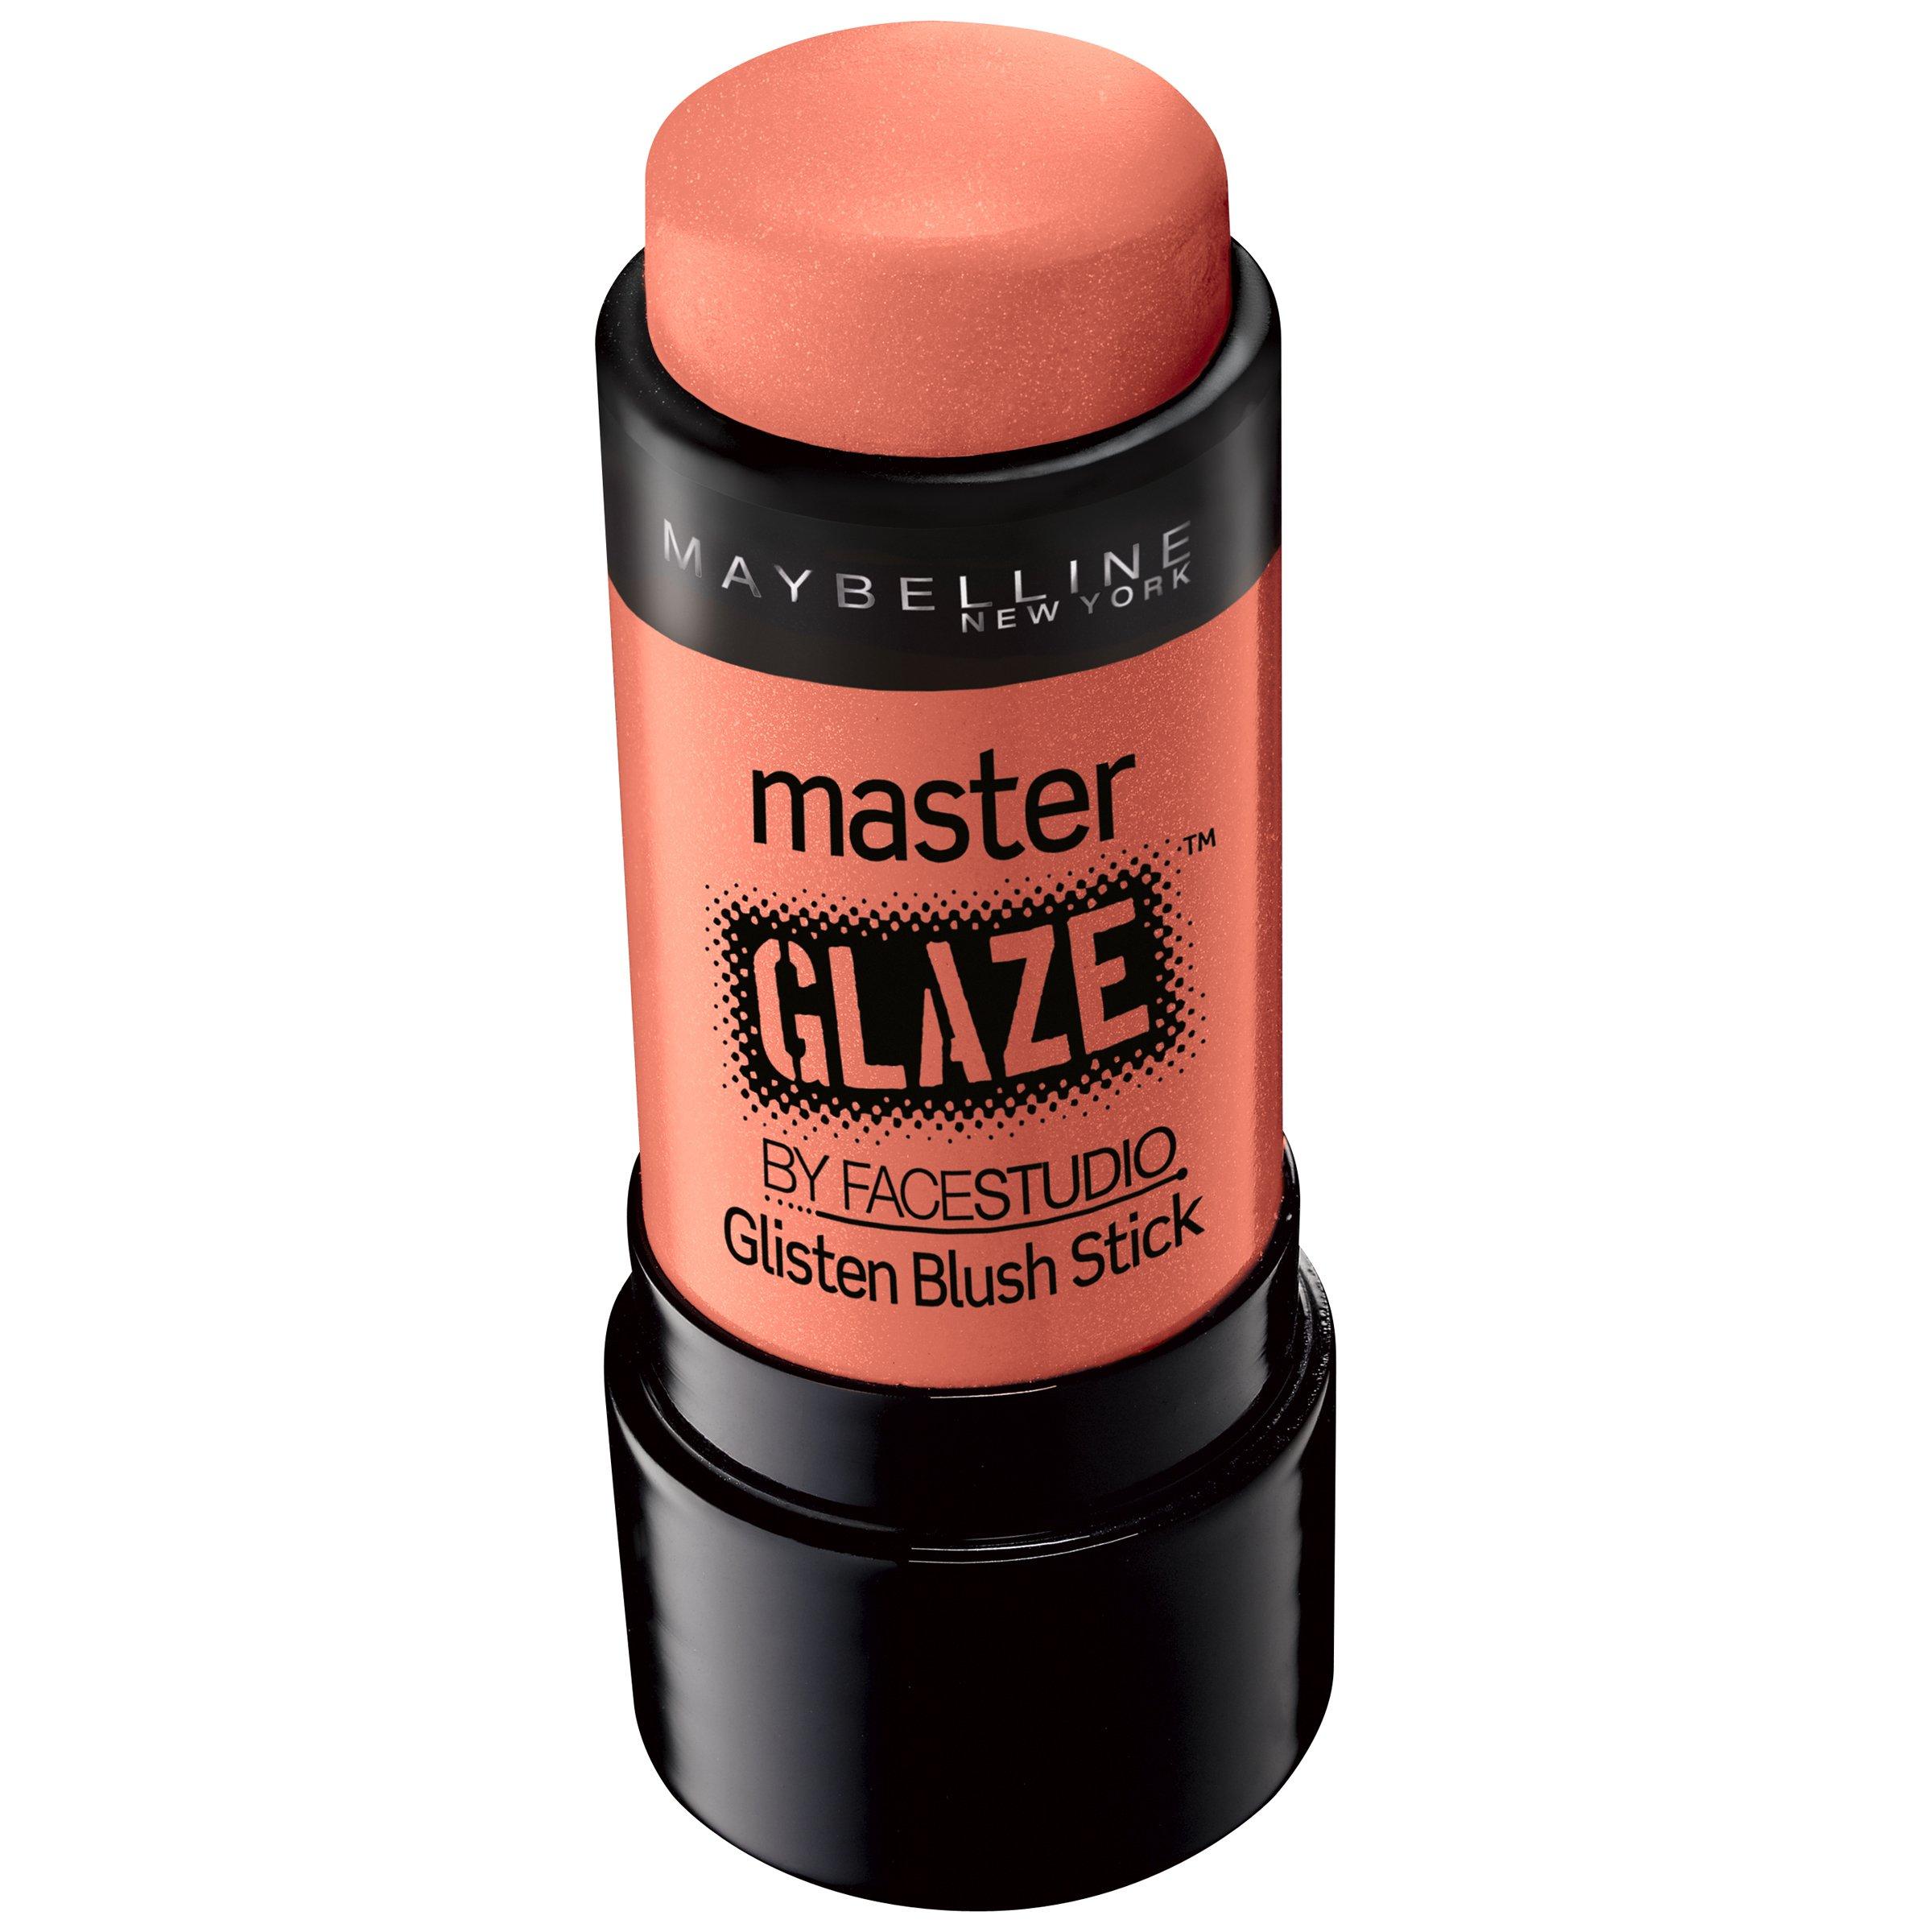 Maybelline New York Face Studio Master Glaze Glisten Blush Stick, Coral Sheen, 0.24 Ounce